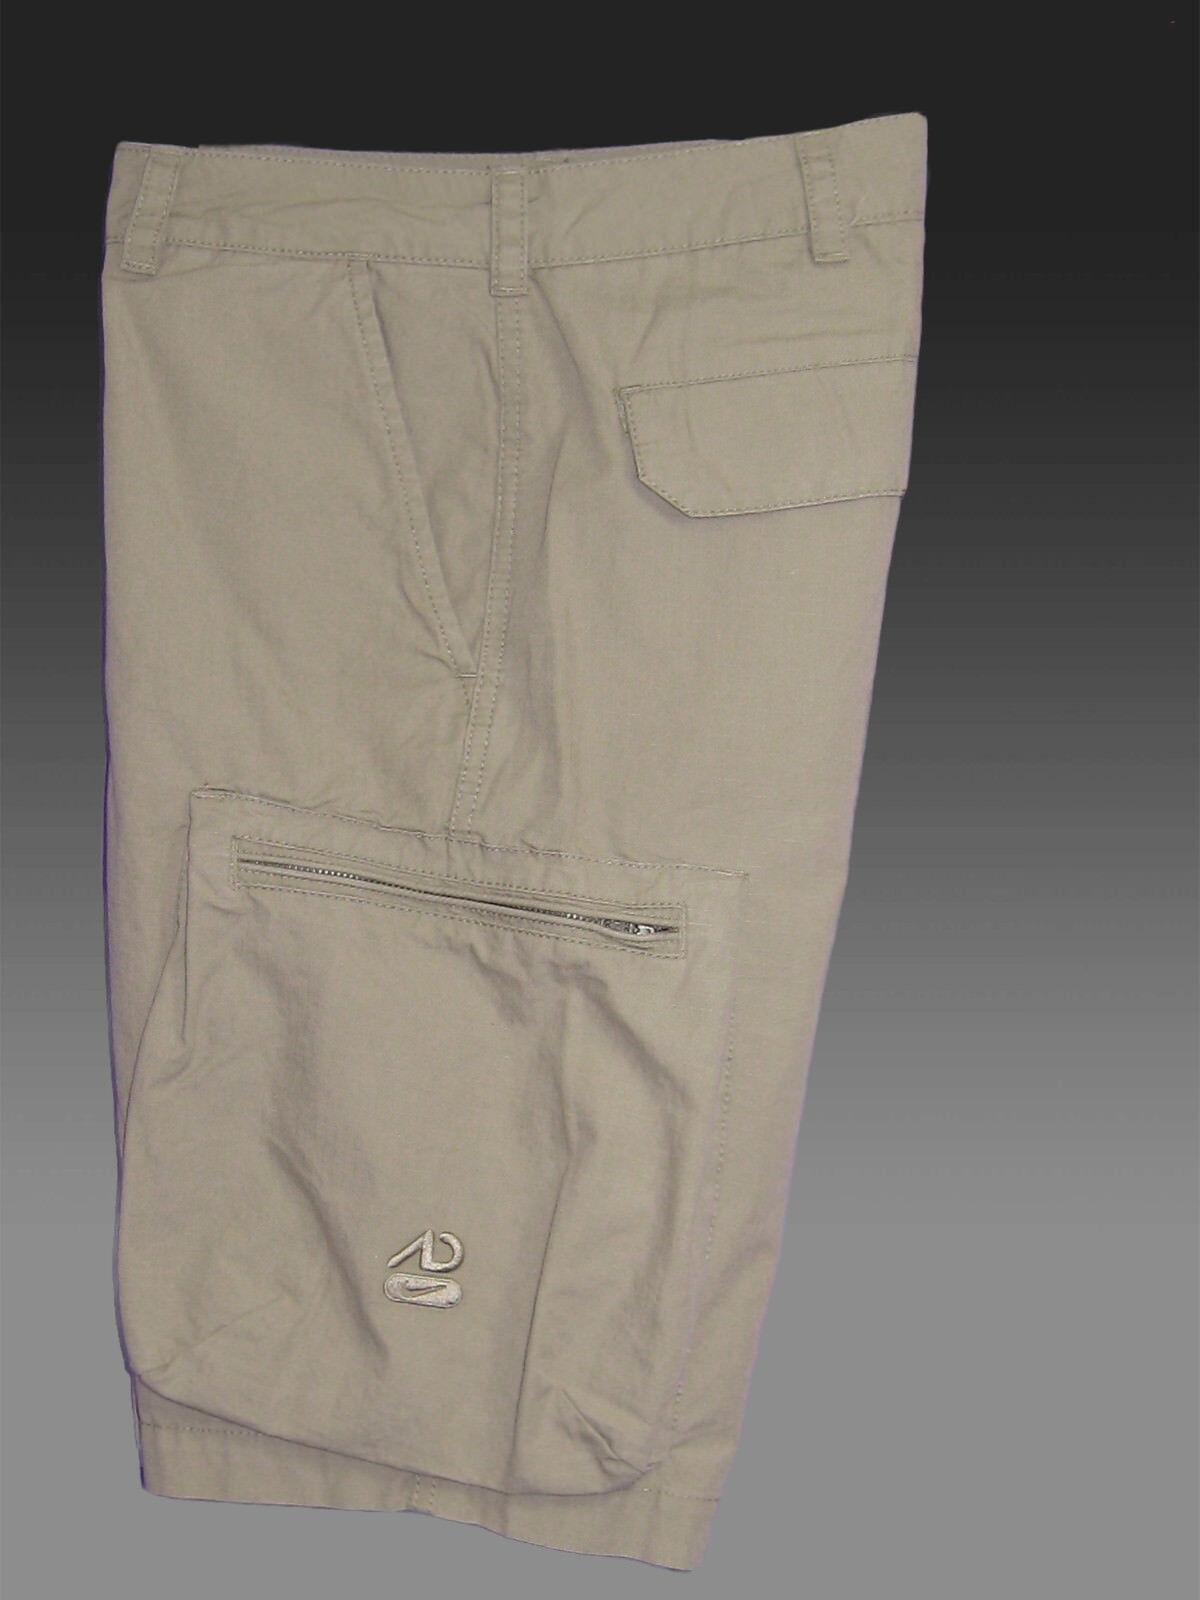 Nuove Nike Athletic Dept Annuncio Stile Militare Bermuda Khaki 76.2cm